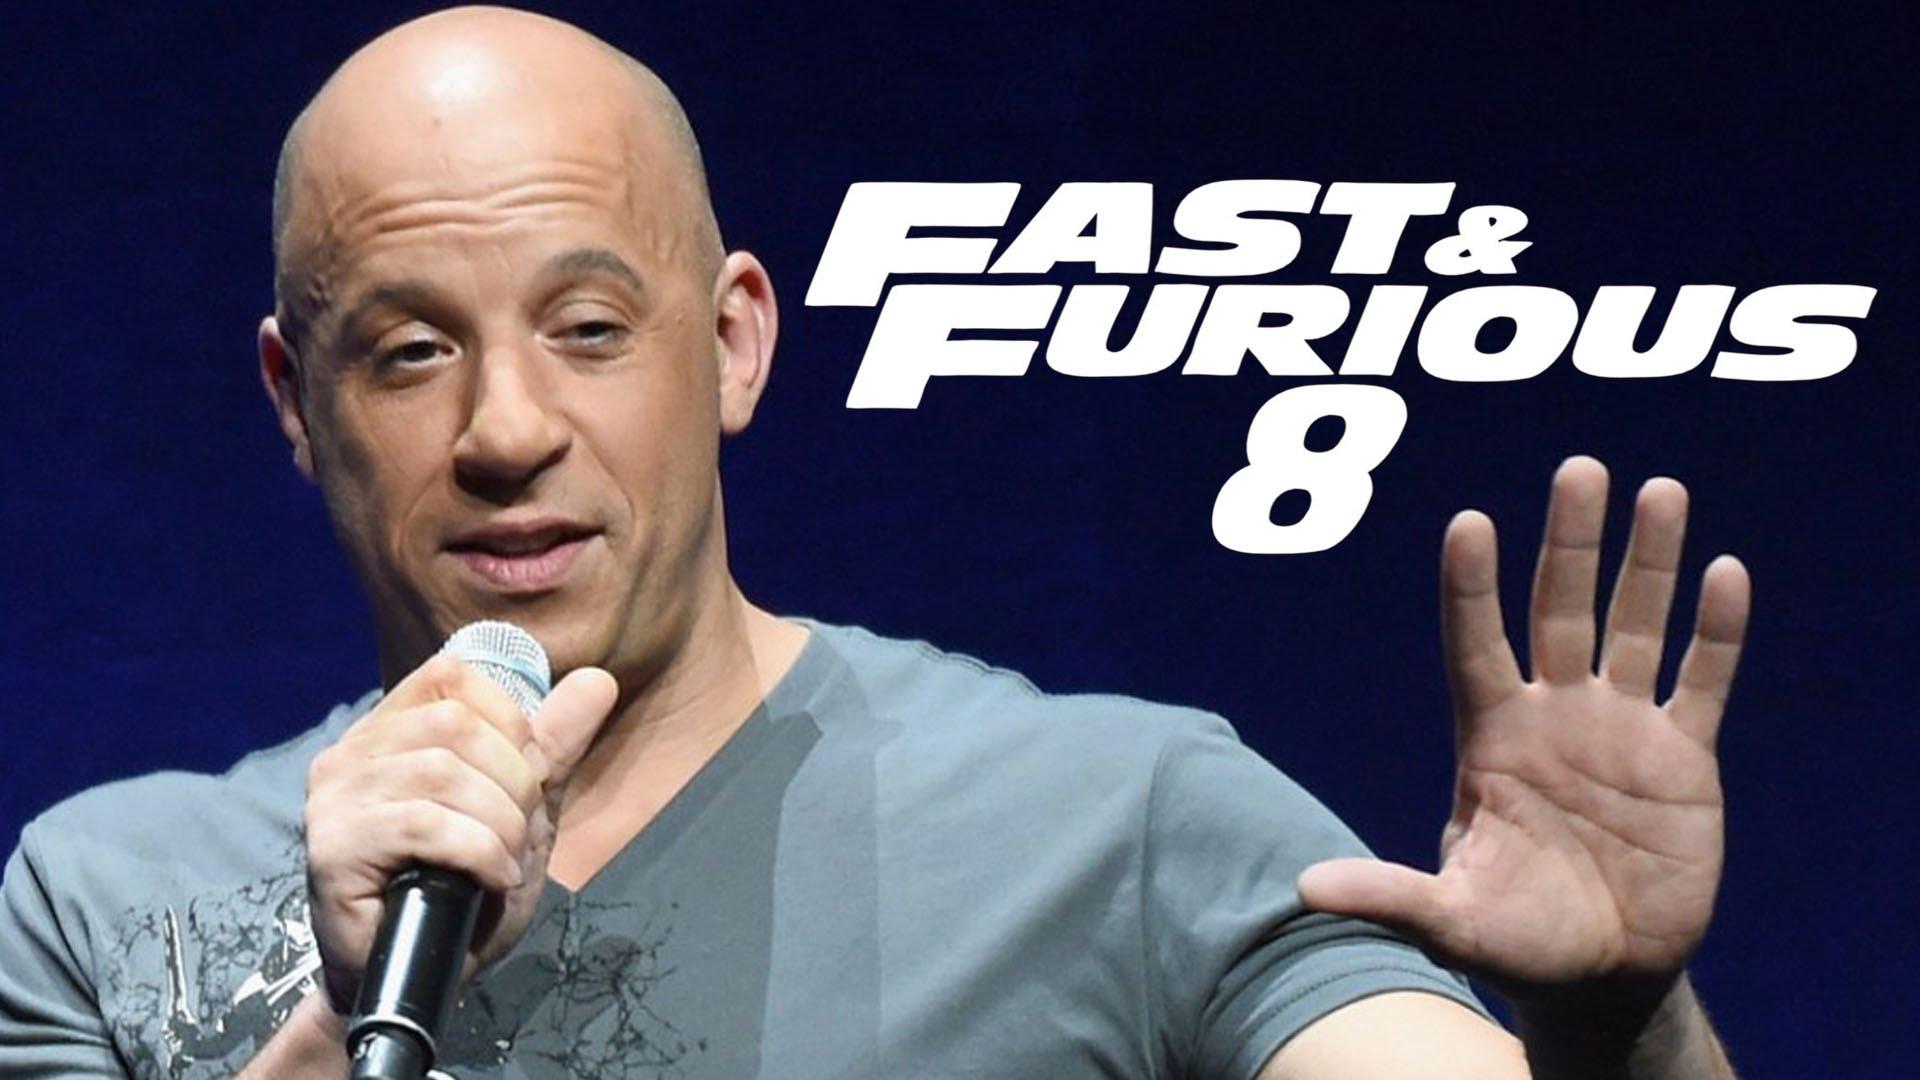 Fast & Furious 8 1